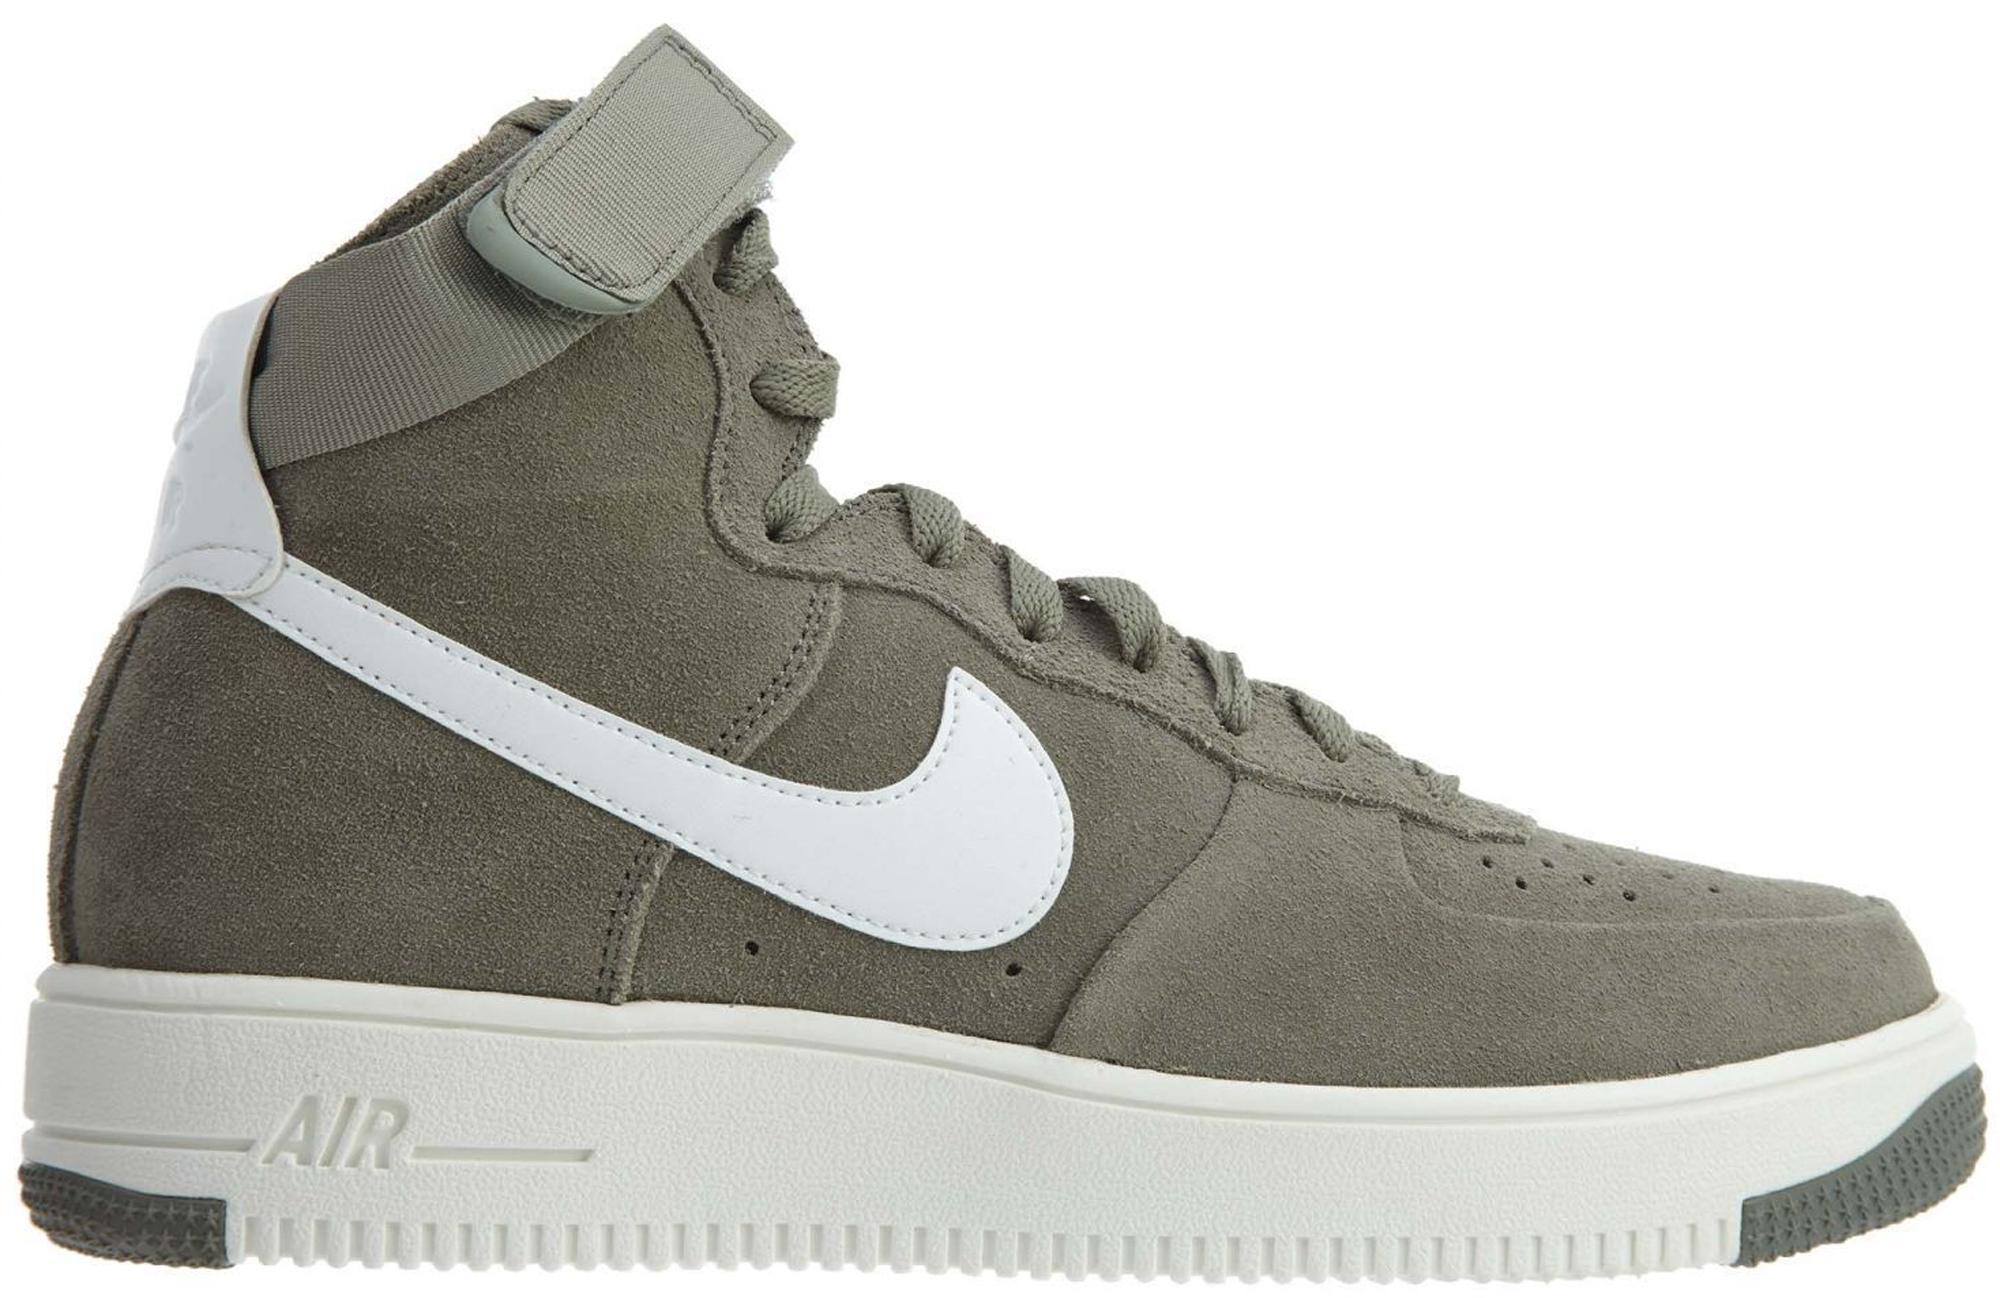 Nike Air Force 1 Ultraforce High Dark